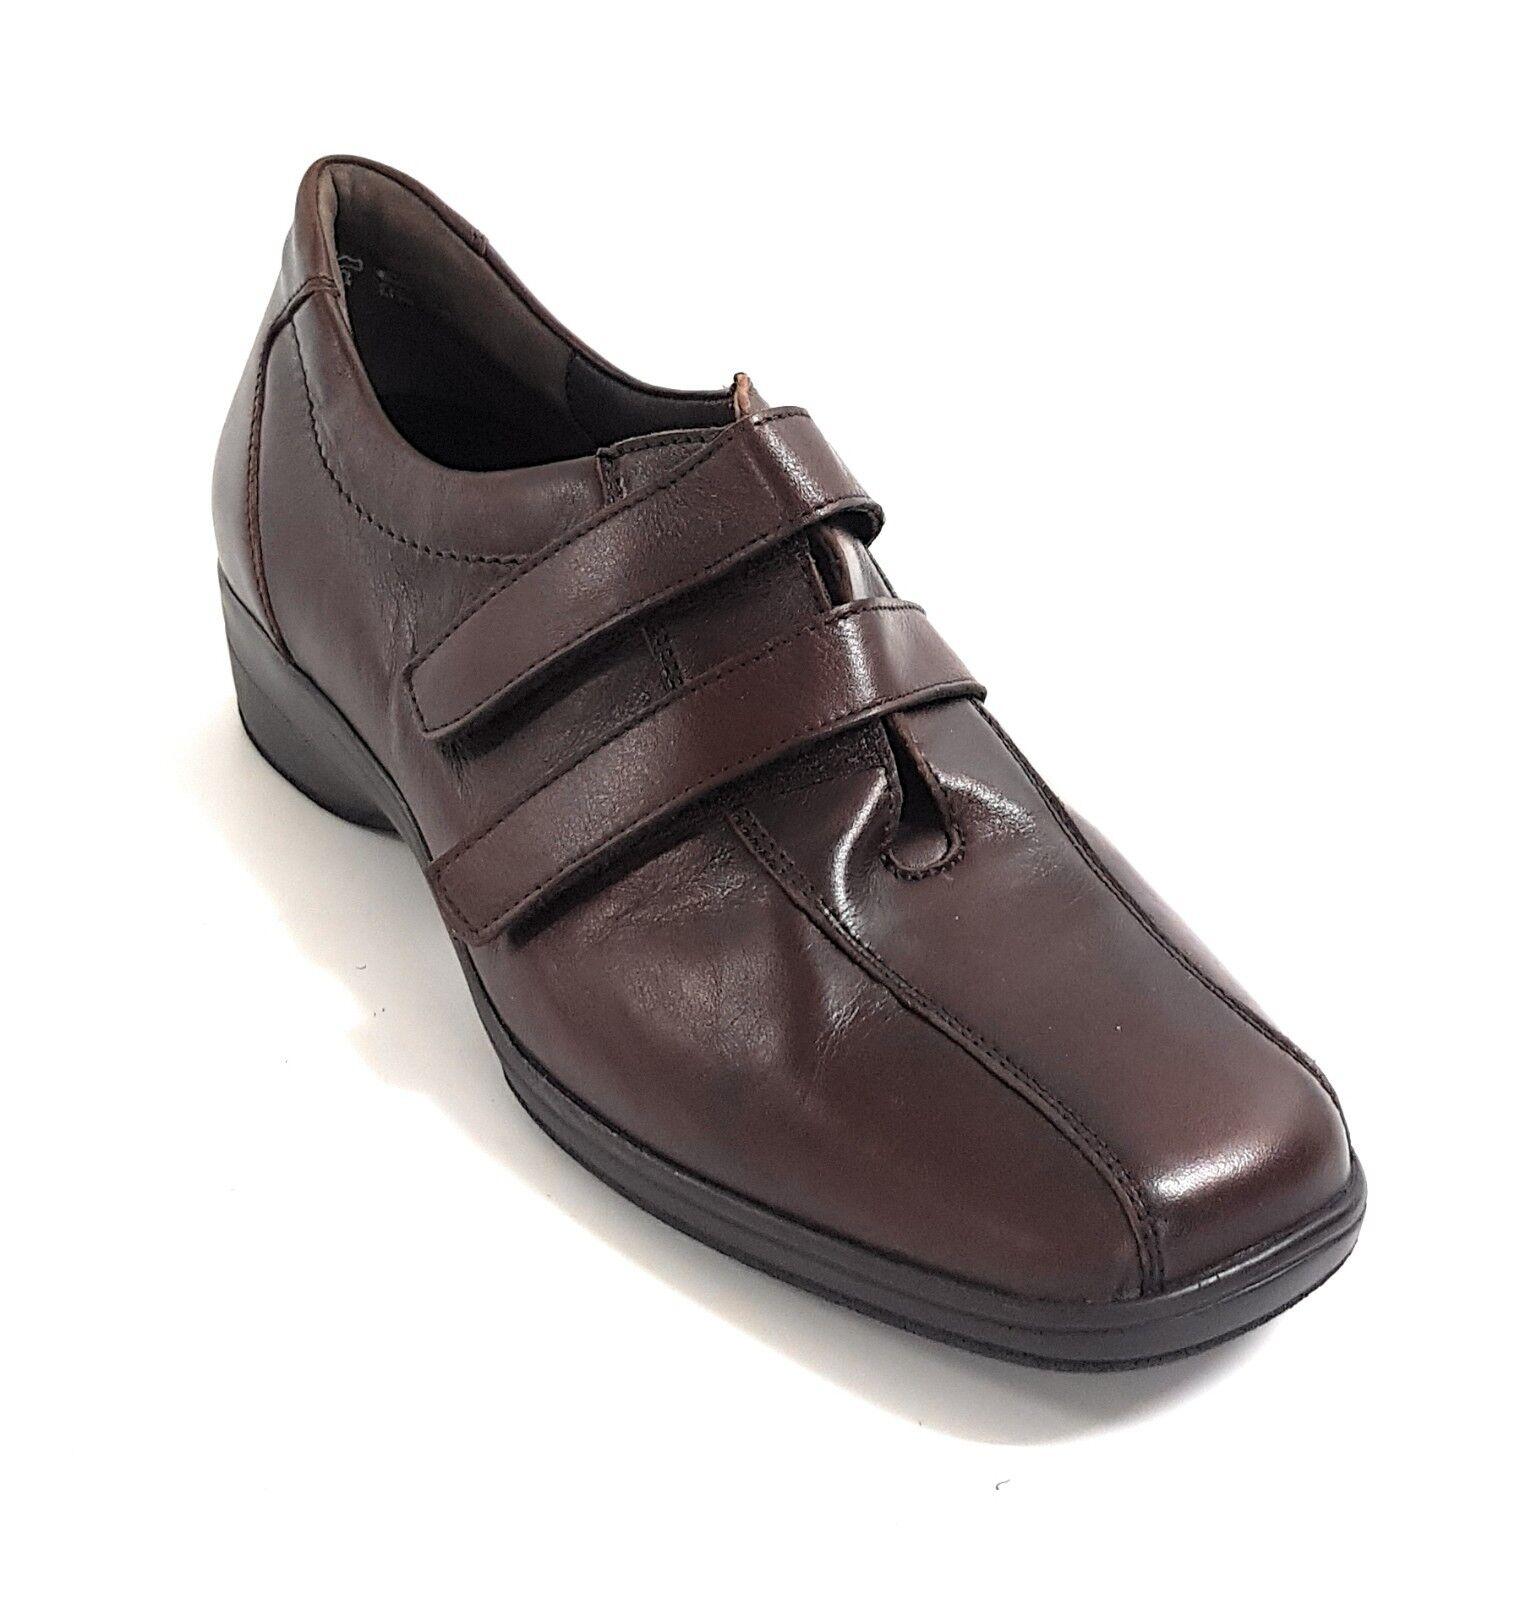 SCHOLL Gelactiv sandali donna pelle TANIA plantare gel Gelactiv SCHOLL calzata ampia NAVY BLU 1f2c9c